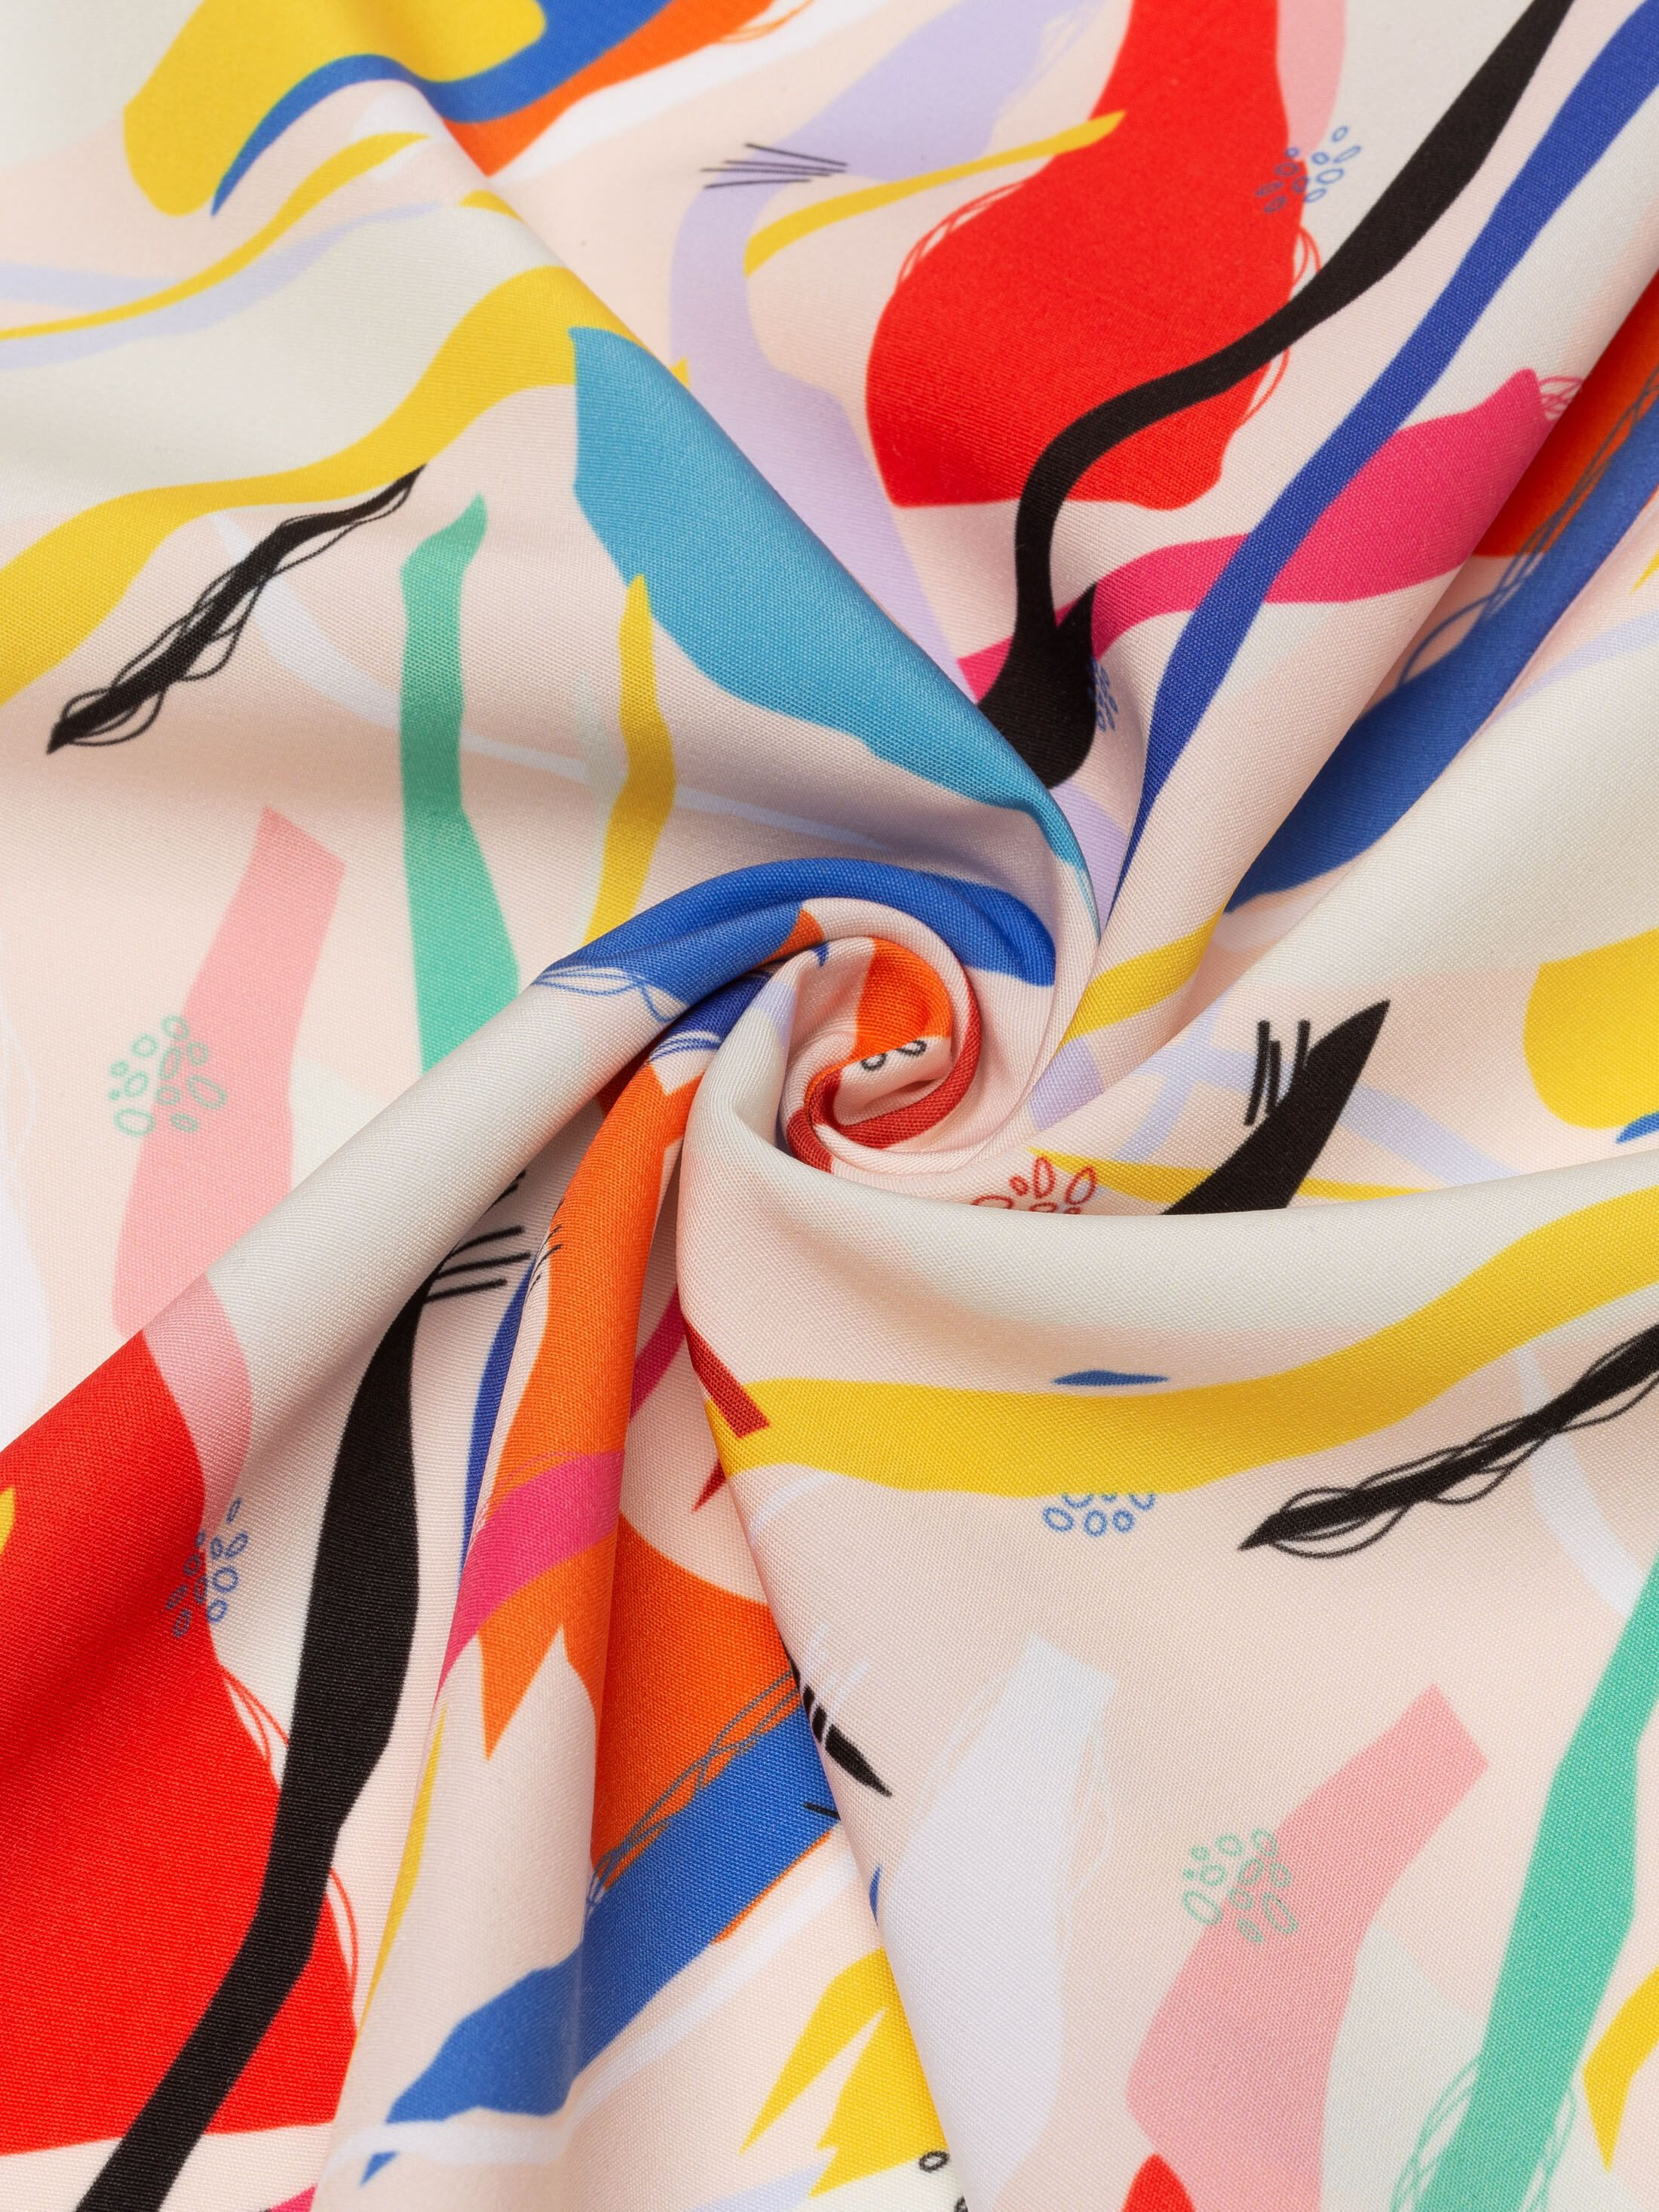 tissu Polyester aspect coton personnalisable